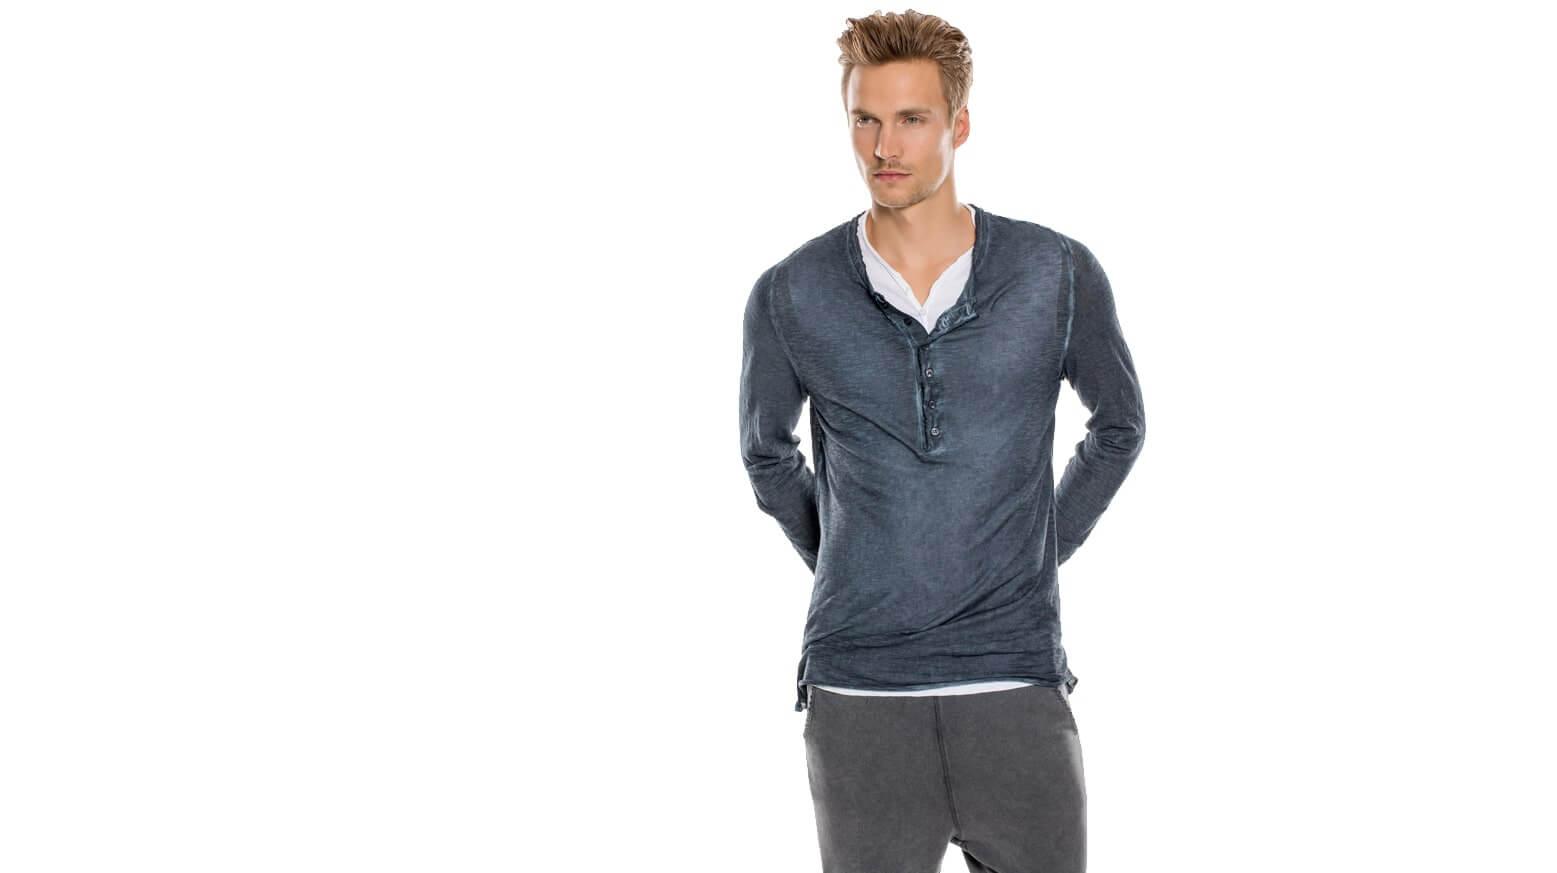 DRAKEWOOD Henley Supima Shirt Stefan Biergans